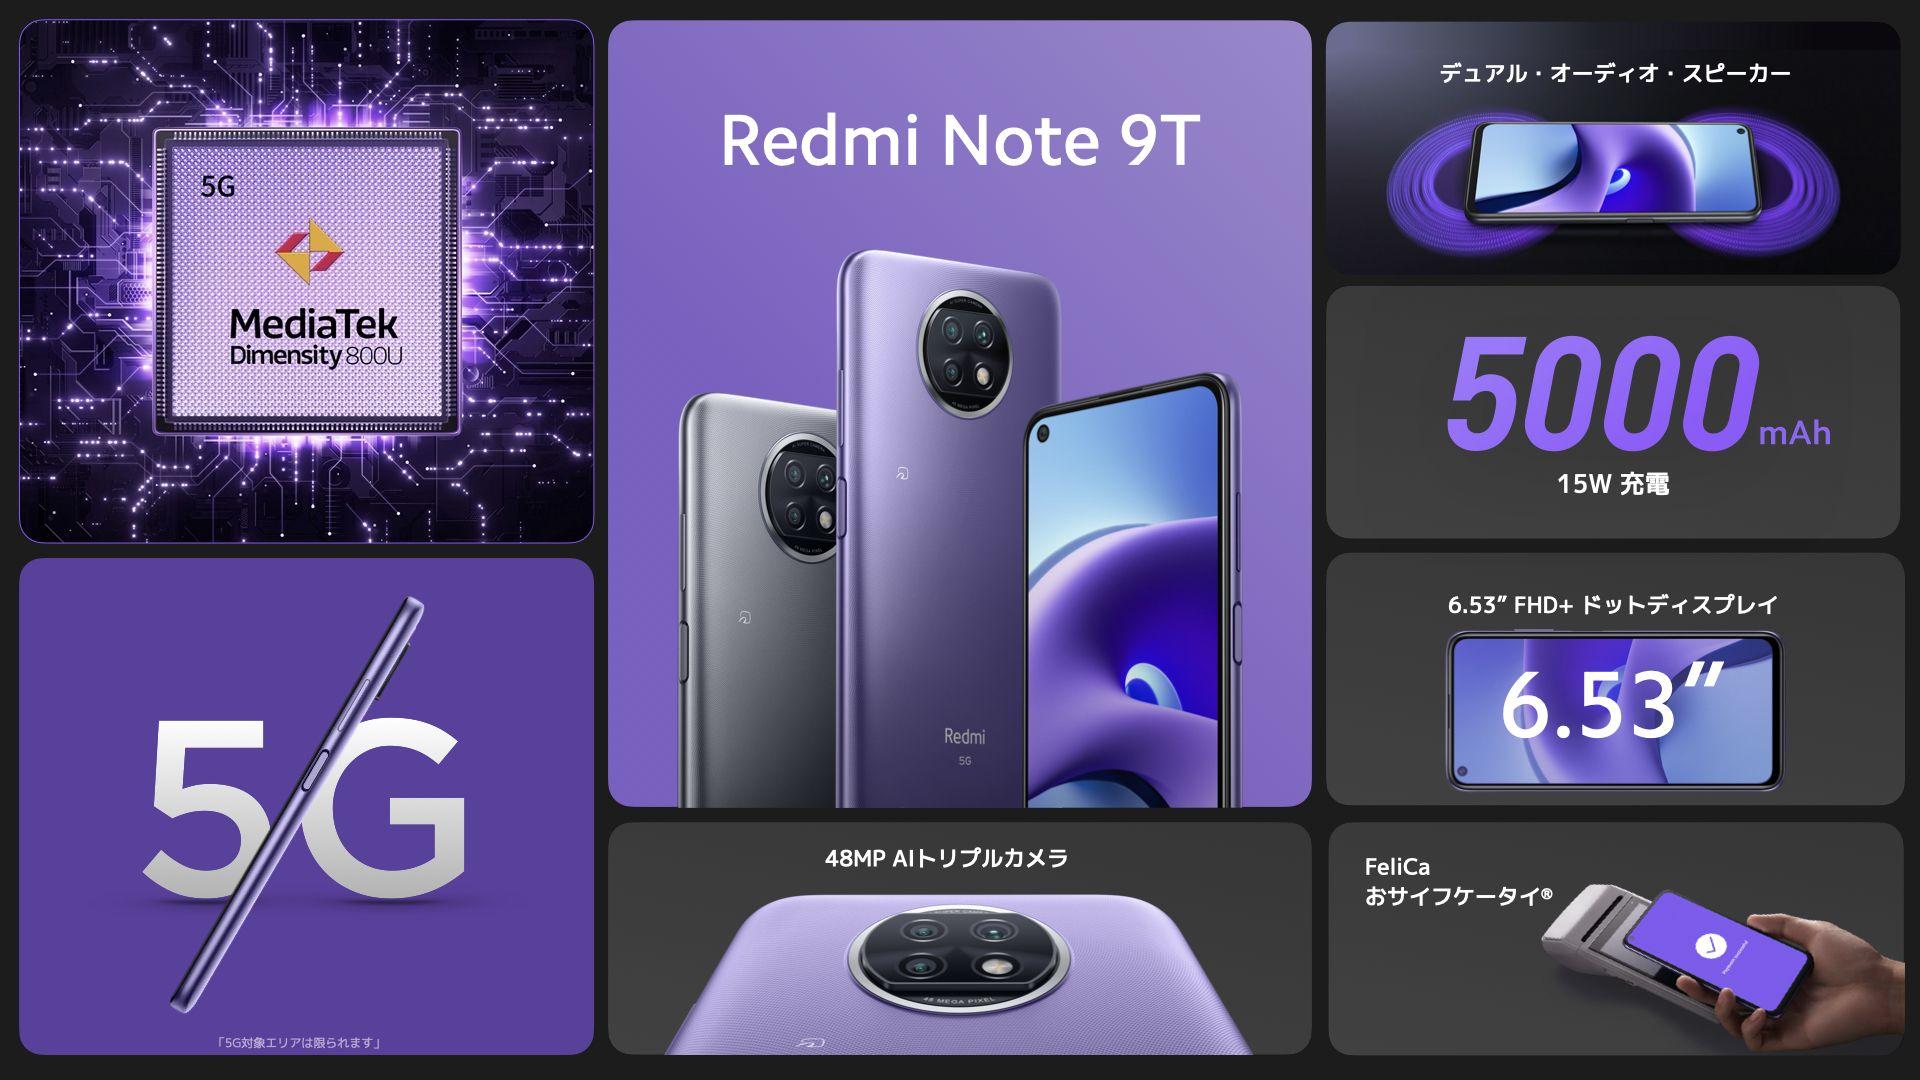 XiaomiがSoftBank専売製品としてRedmi Note 9Tを発表、日本市場初Dimensity搭載製品に